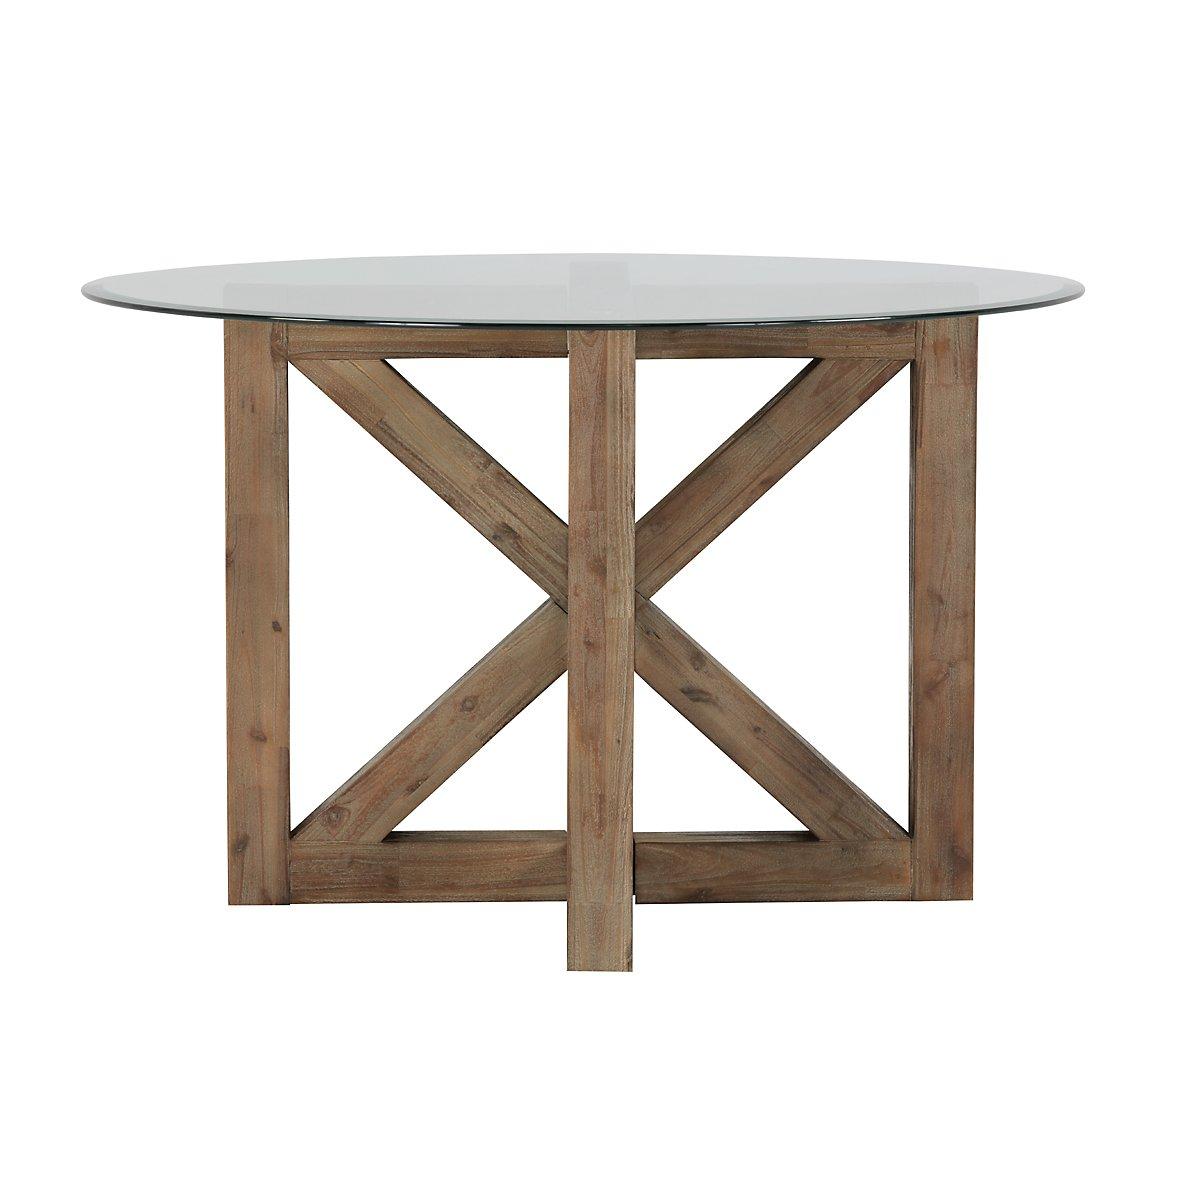 City furniture hampton light tone glass round table for Table top jocel jf 85